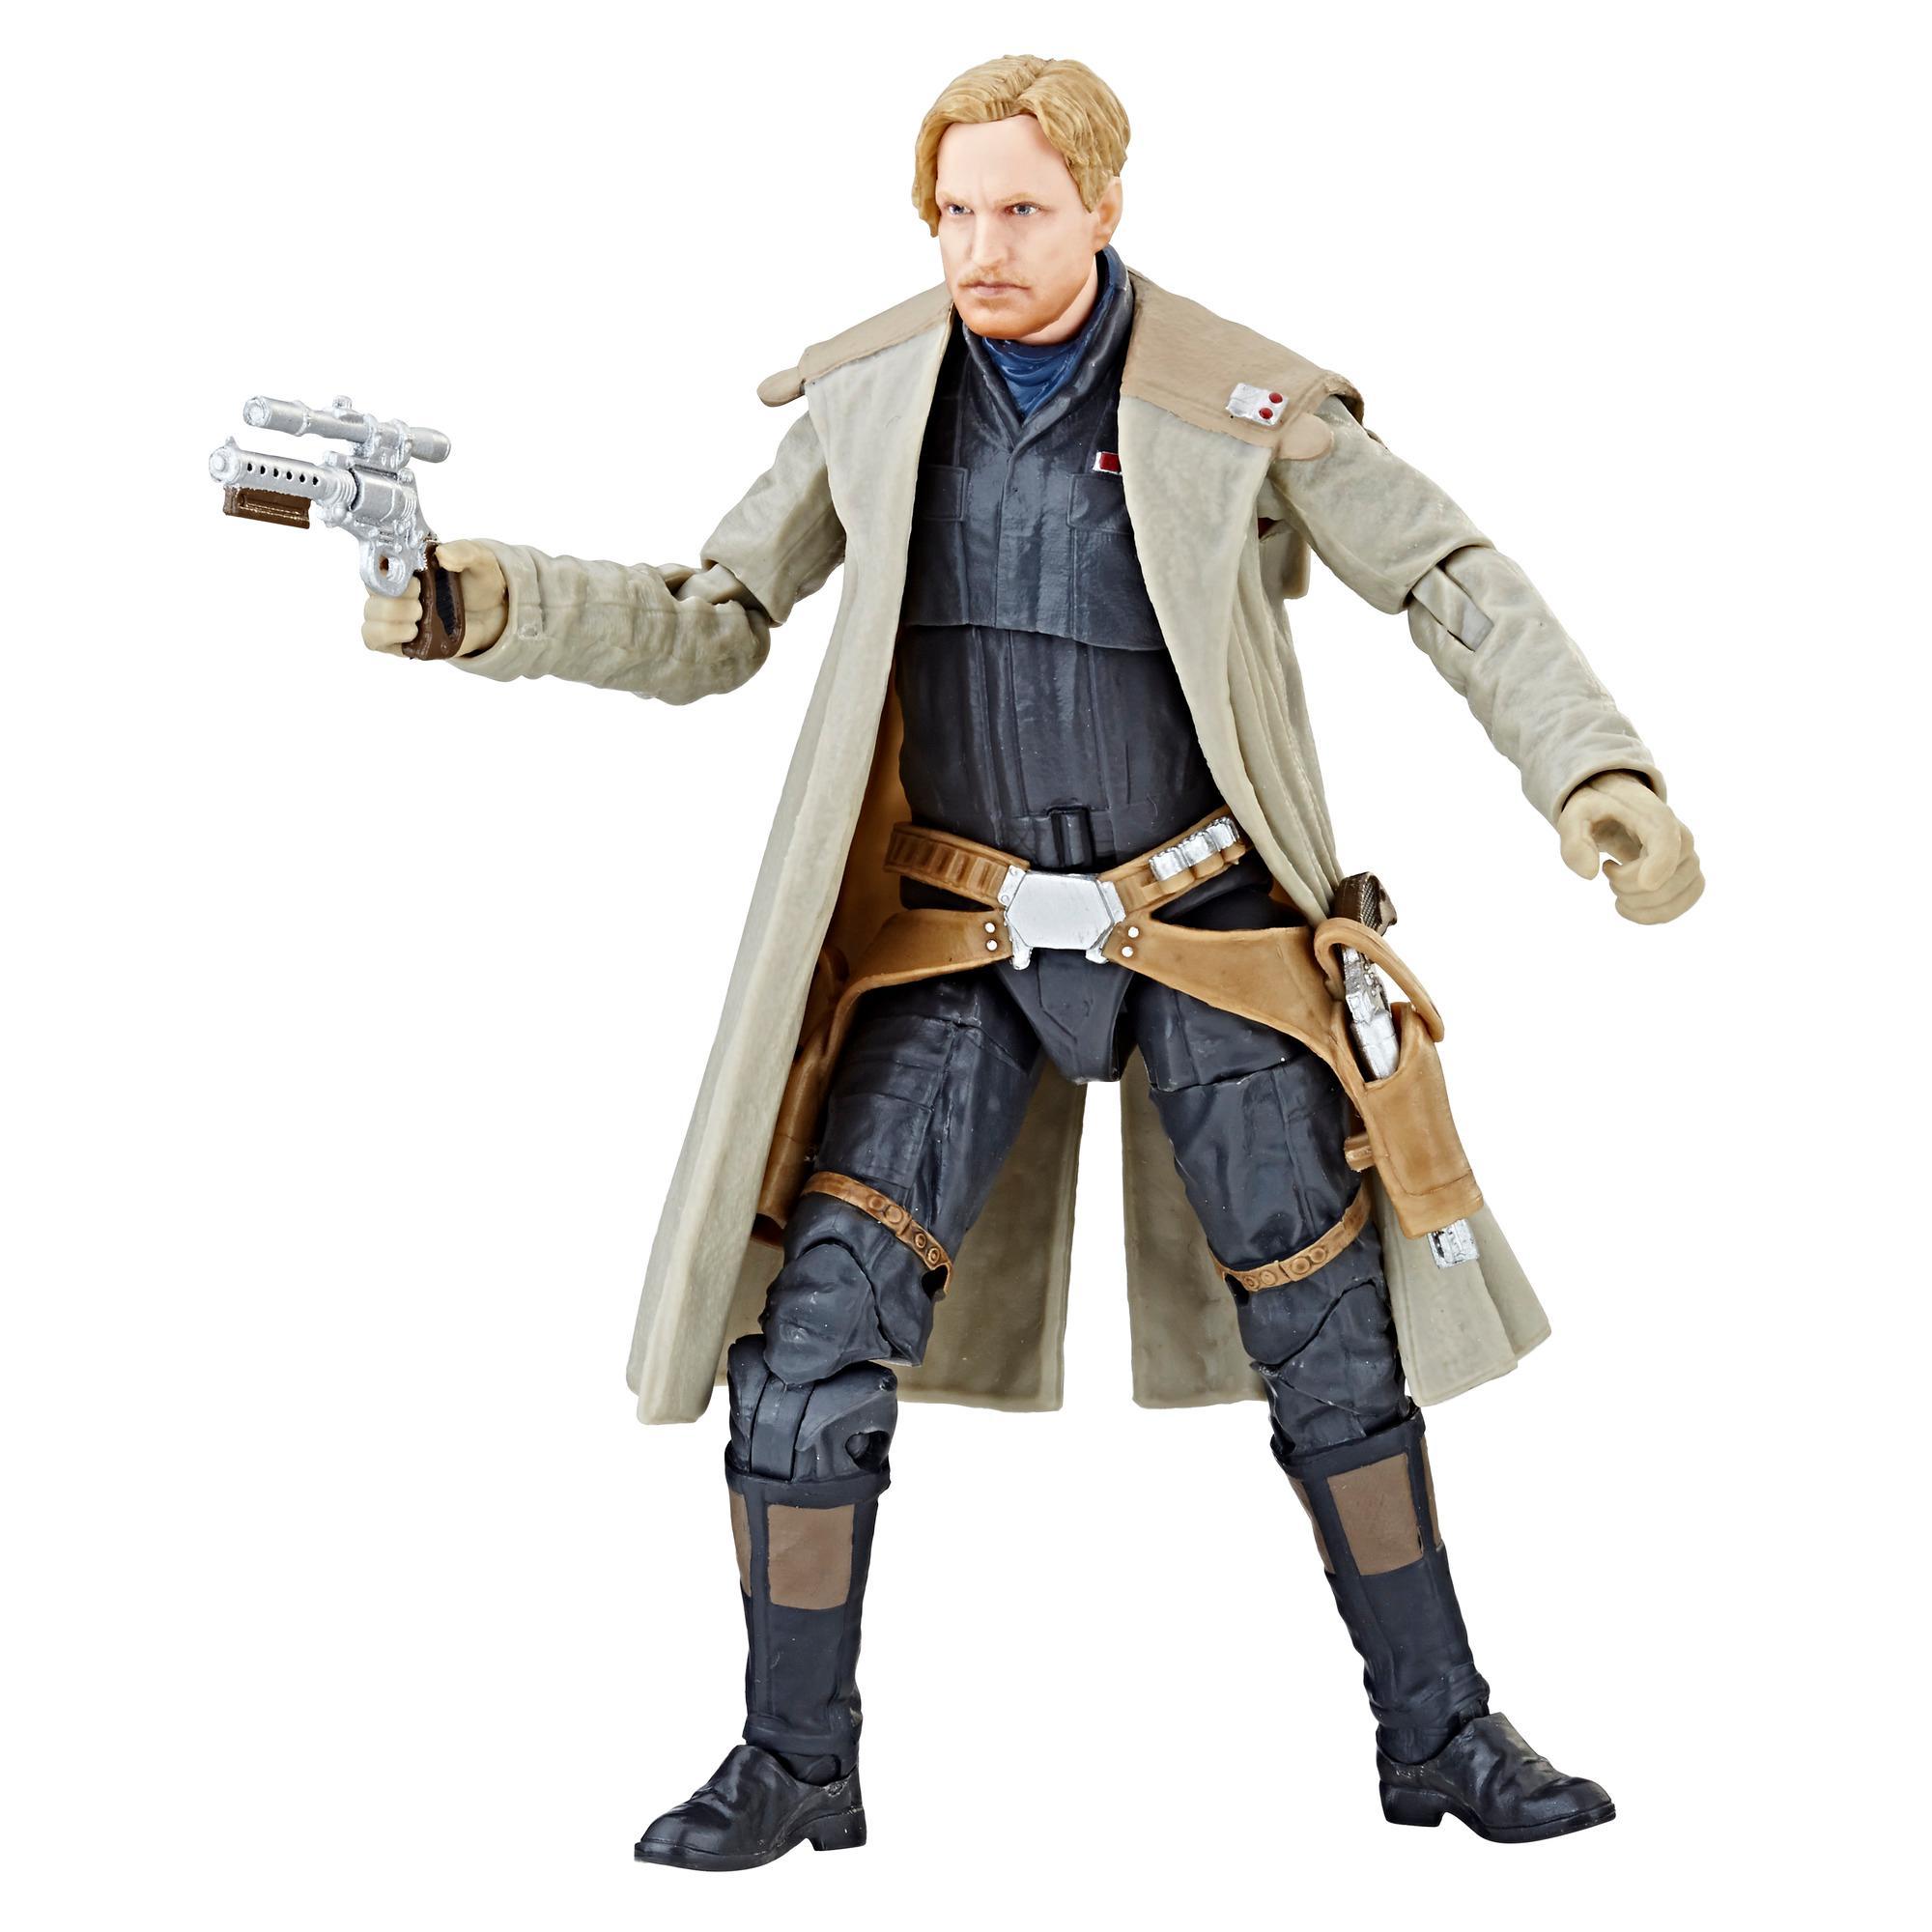 Star Wars The Black Series Mattias Beckett 6-inch-scale Figure